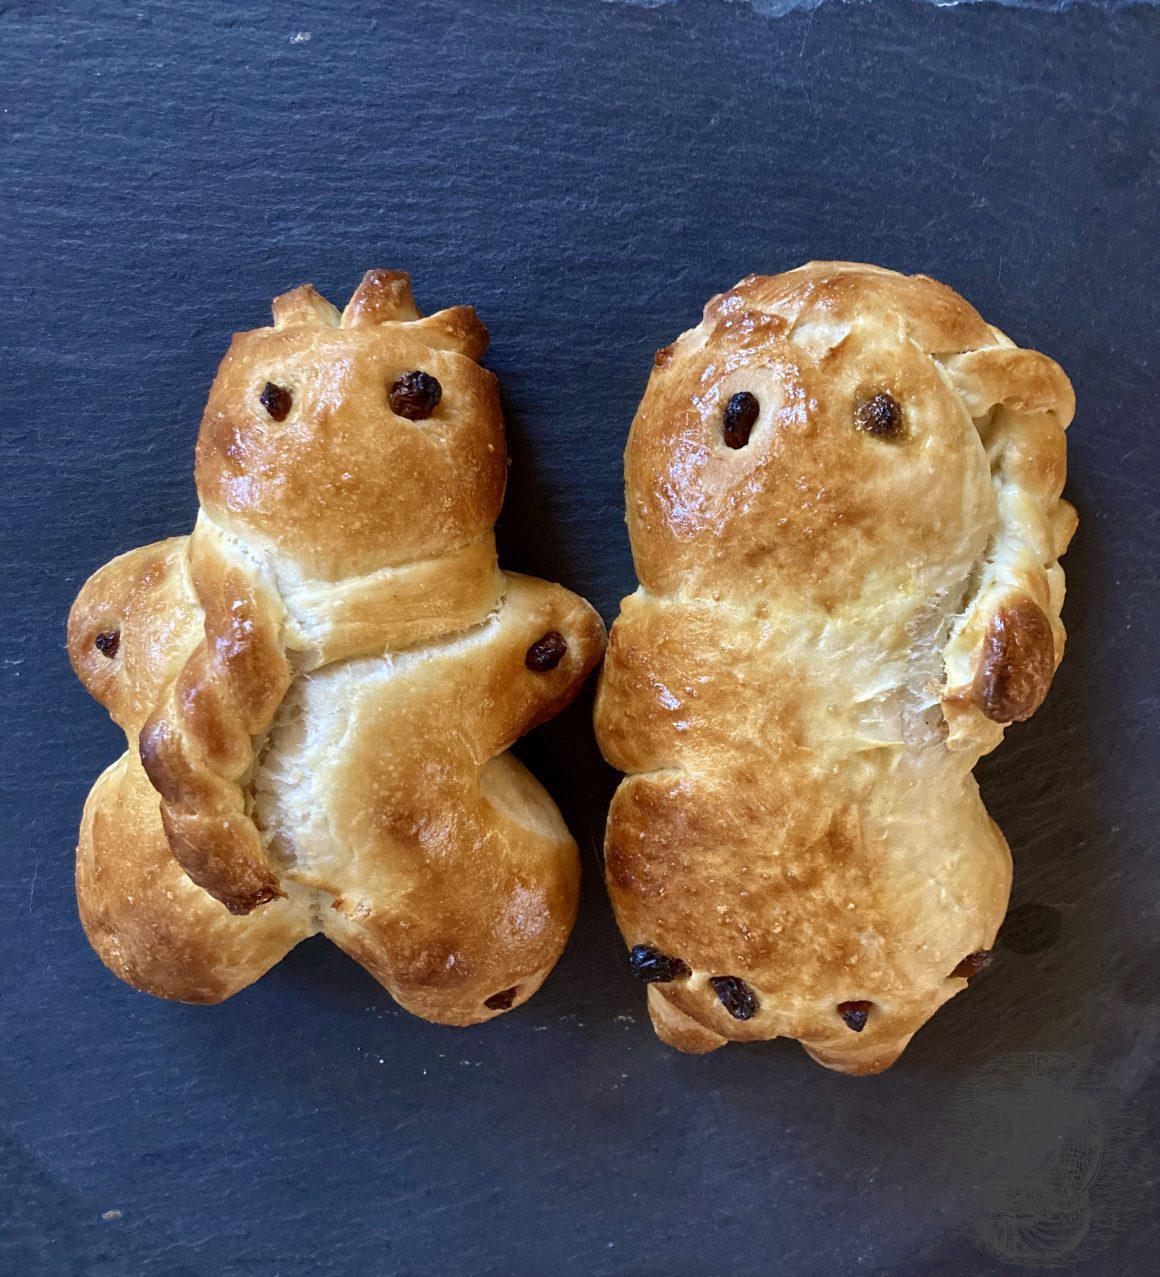 Grittibänz - the bread man